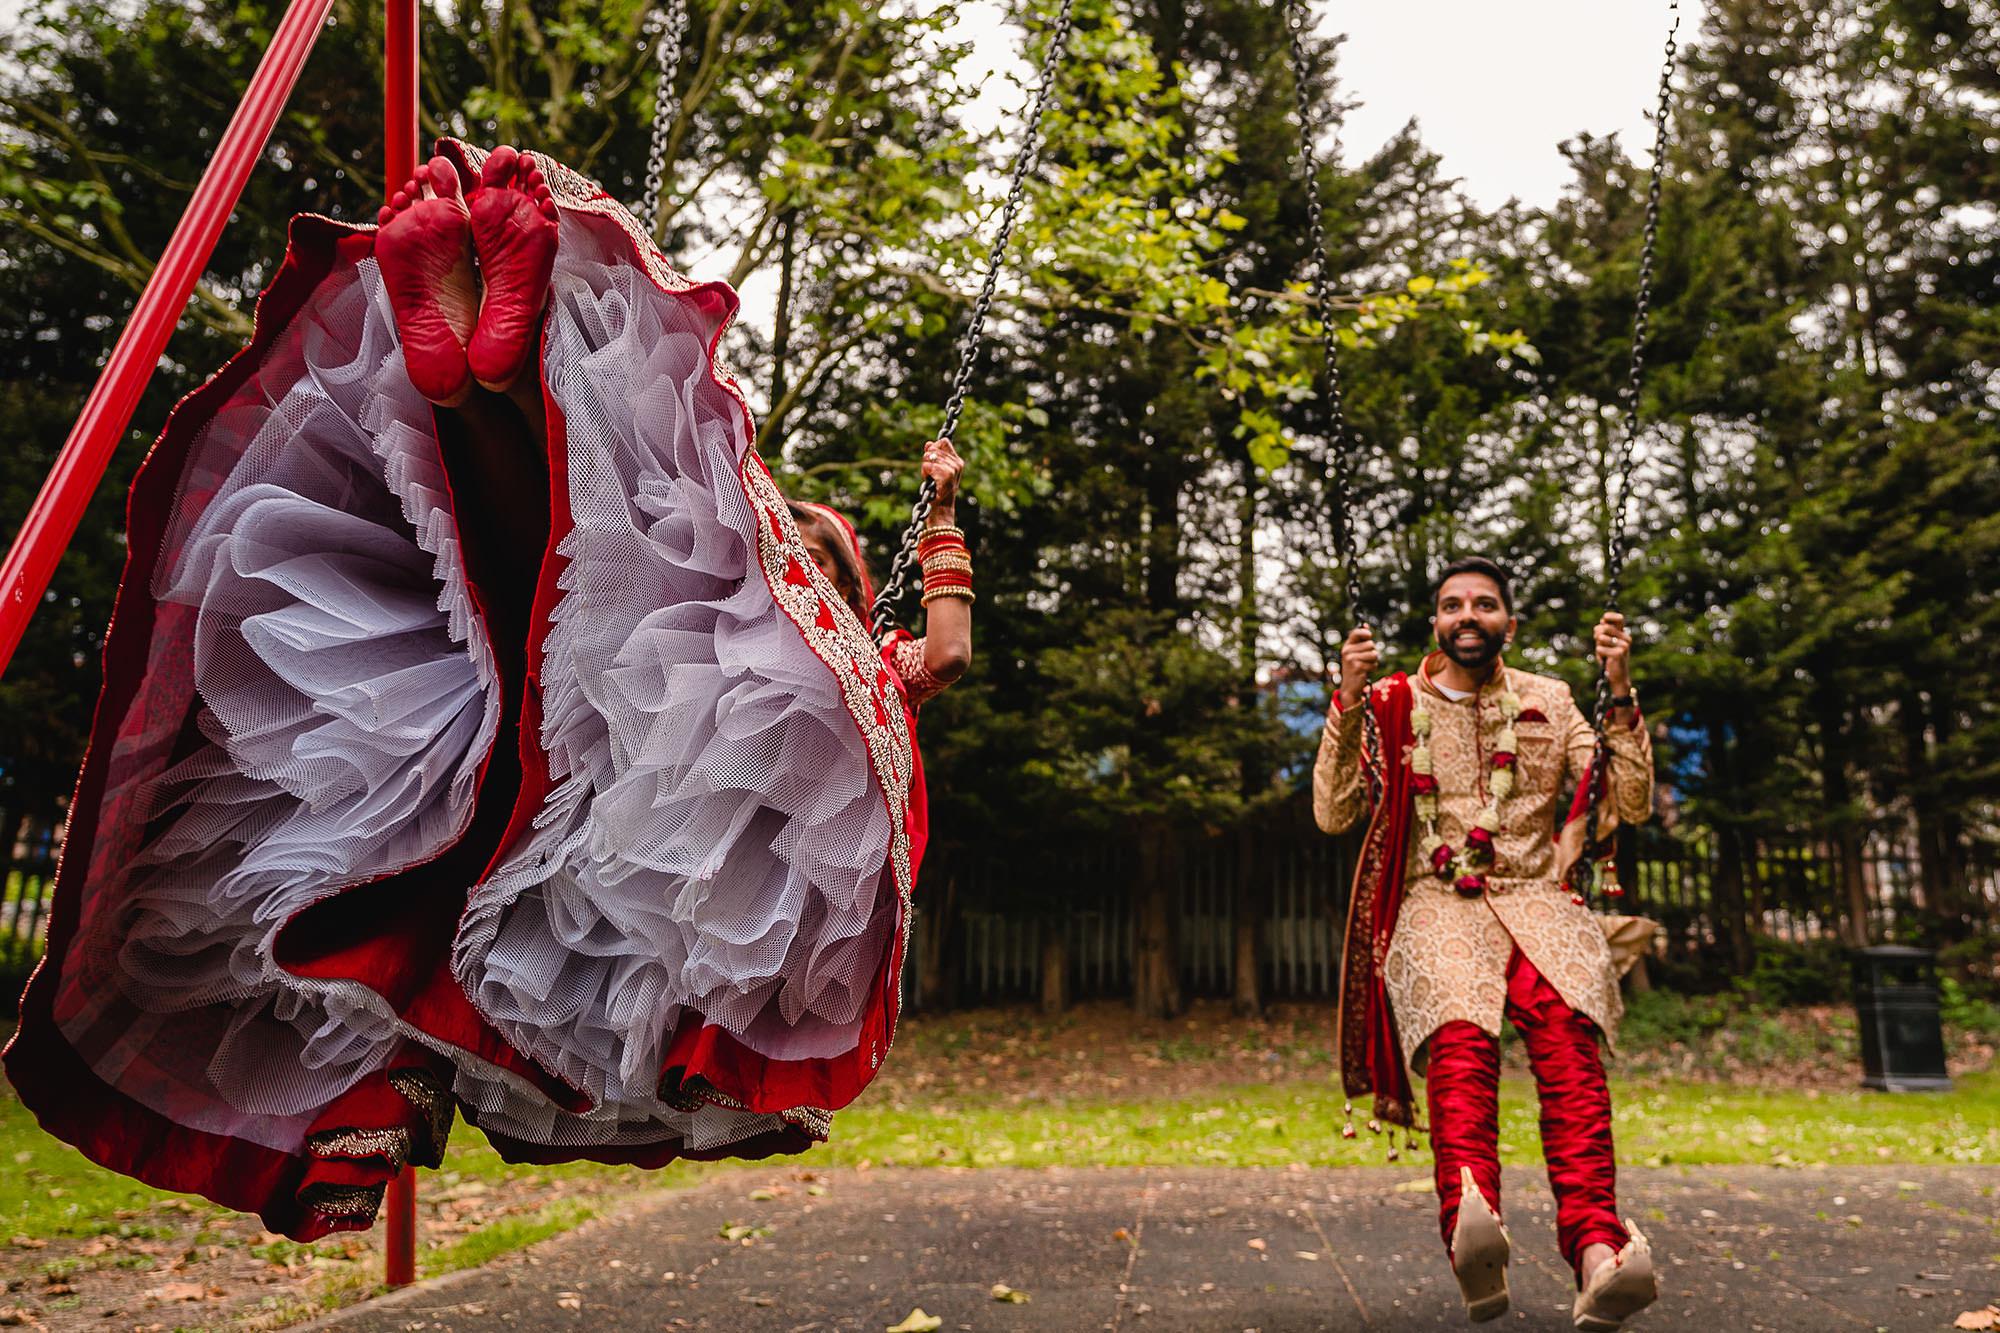 hindu wedding portraits on a swing